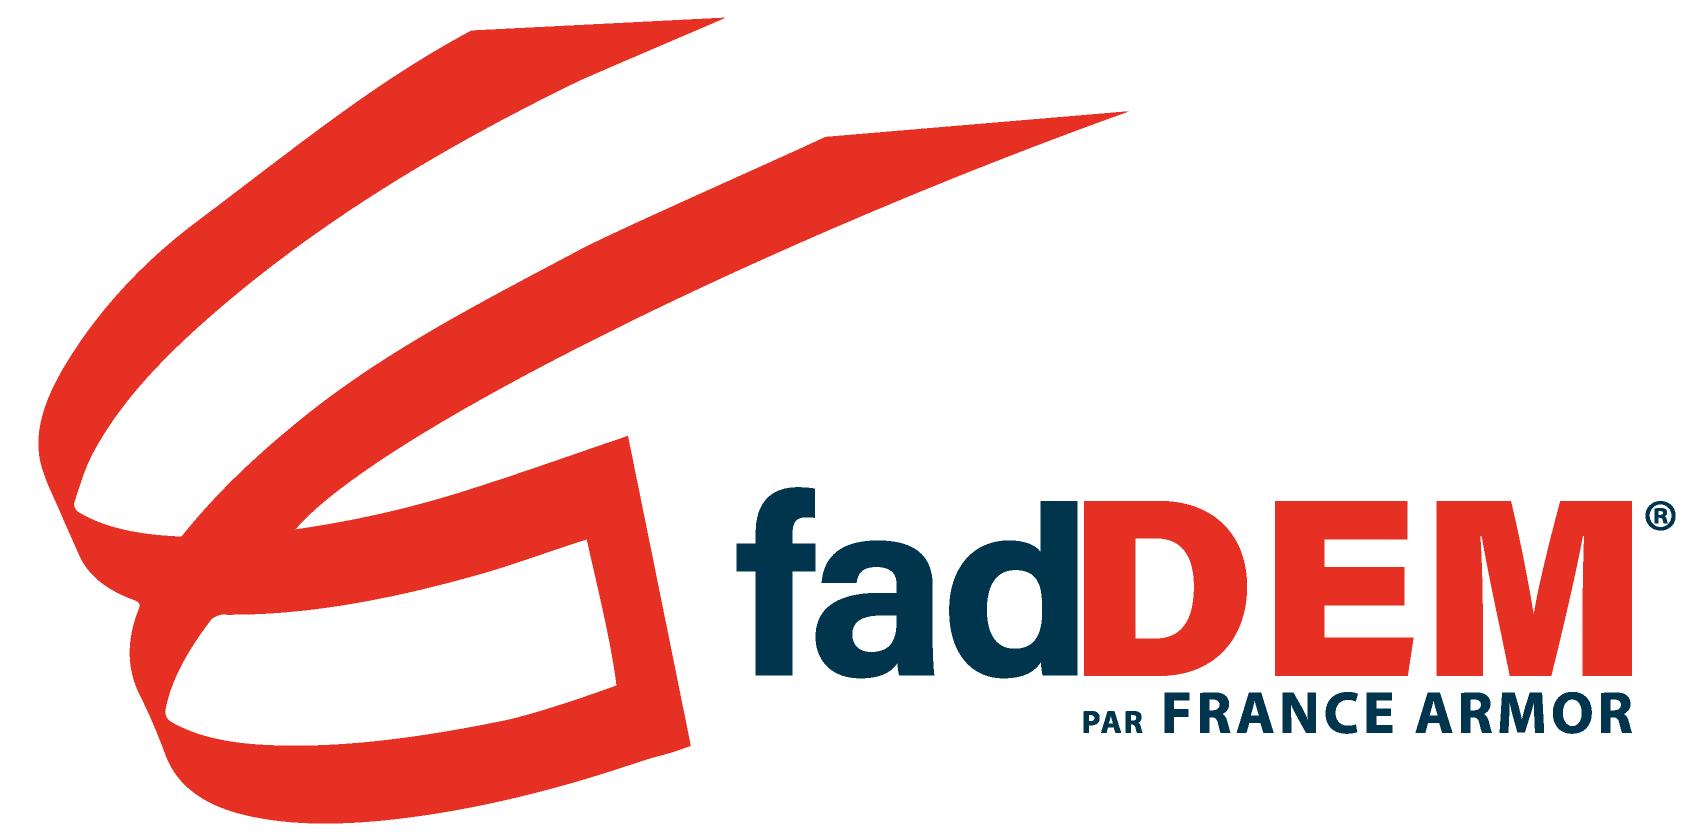 FRANCE ARMOR - Facilities, site du Facility management